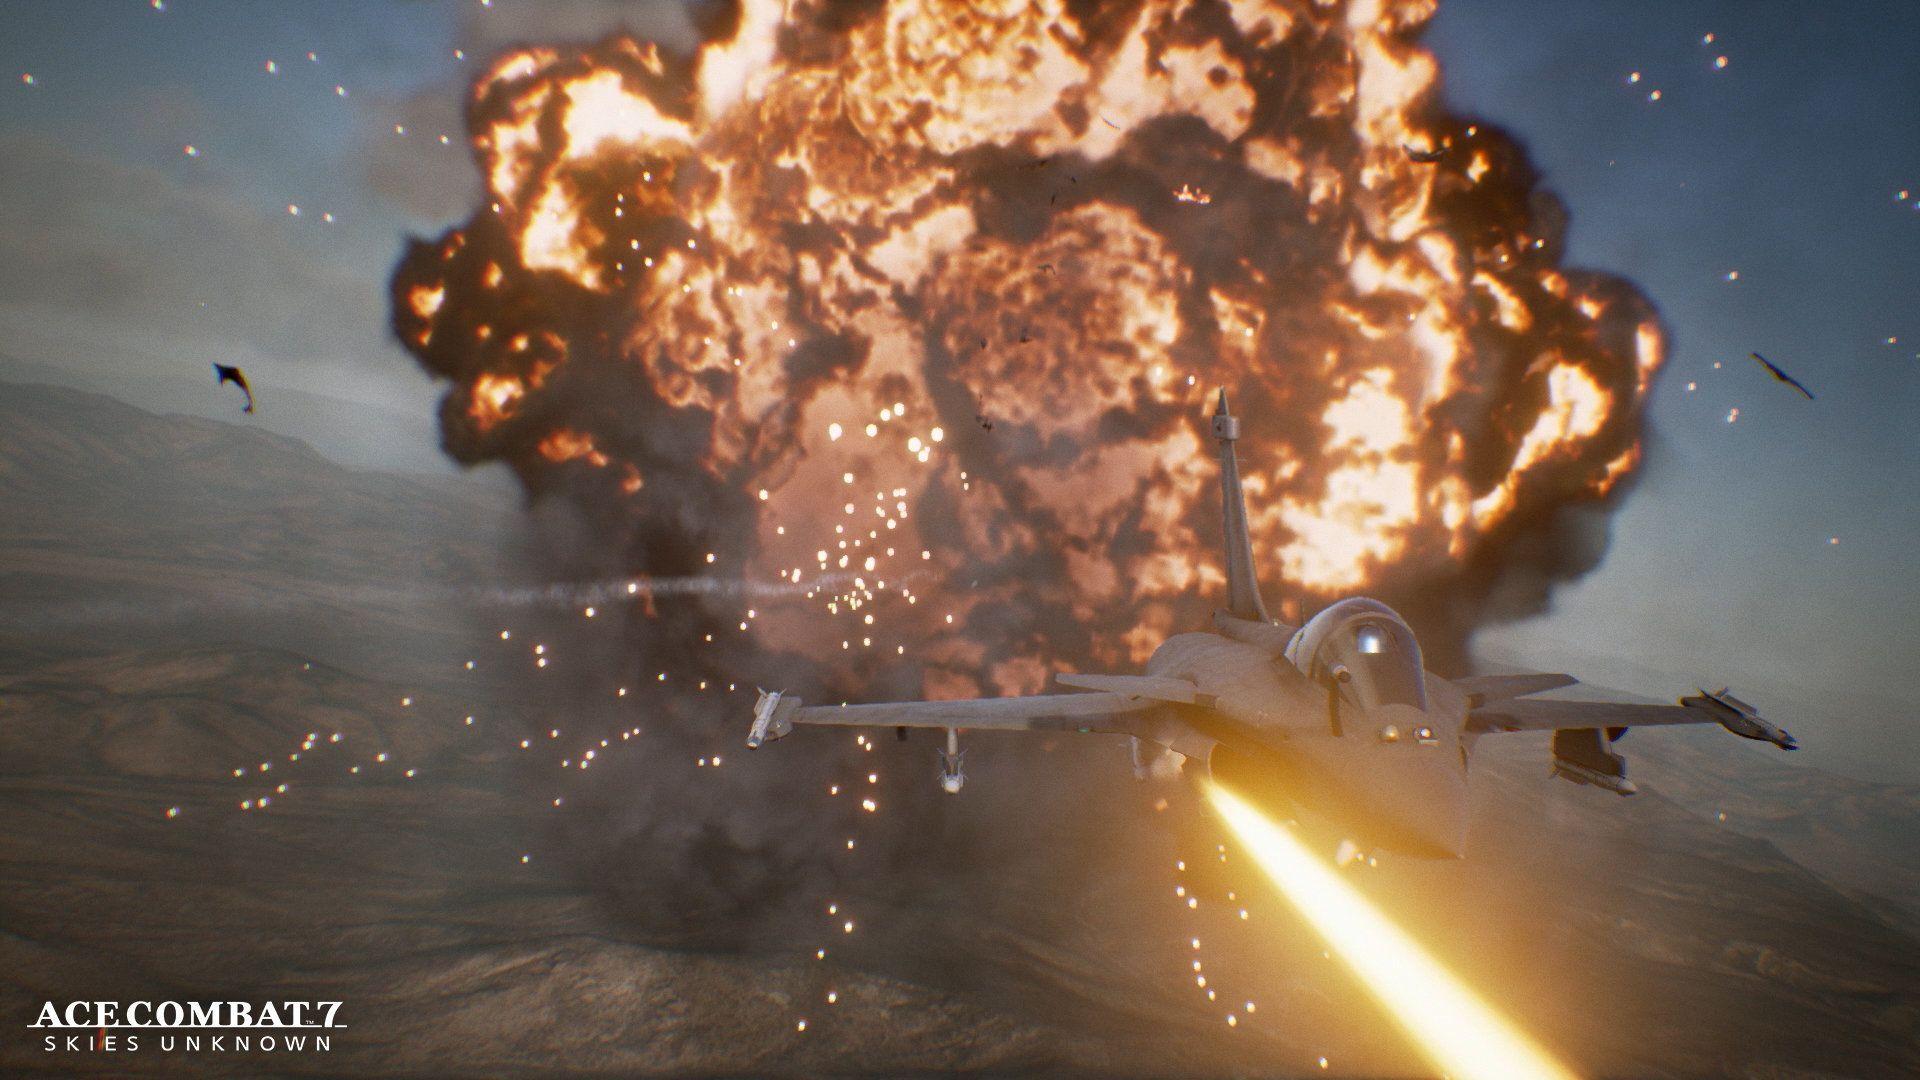 Ace Combat 7 1